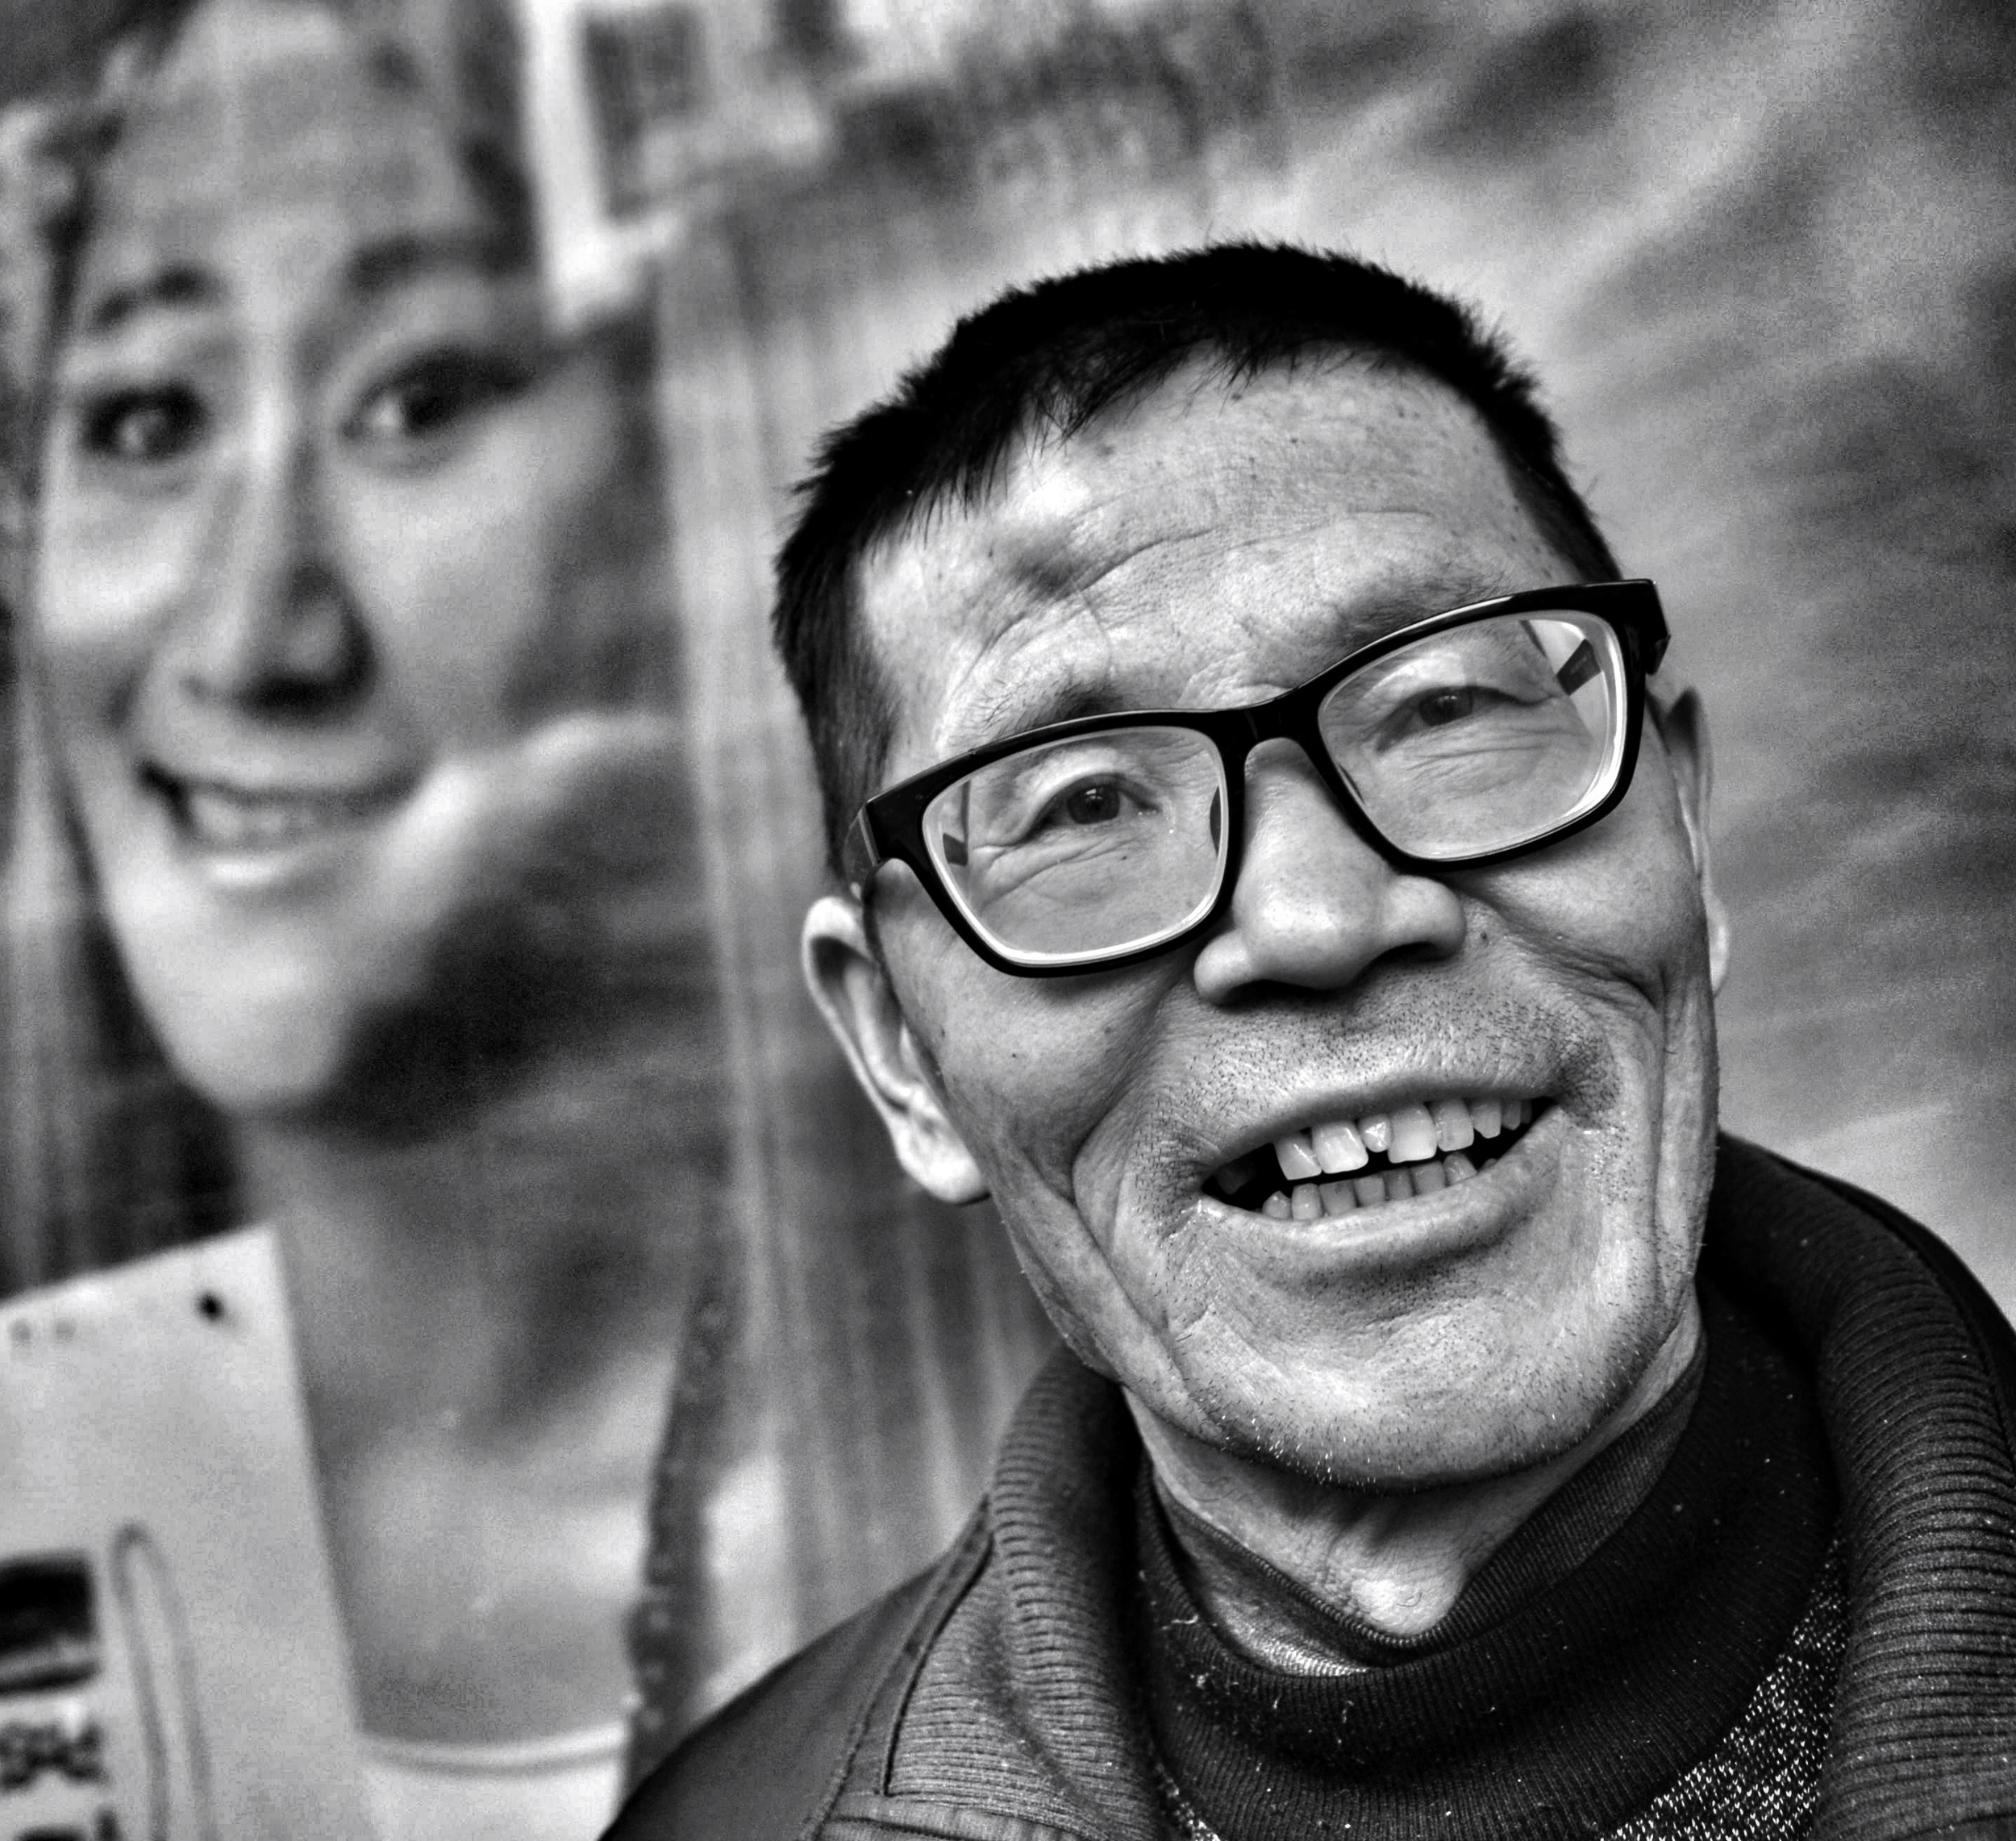 man at a bus stop, han zheng, wuhan